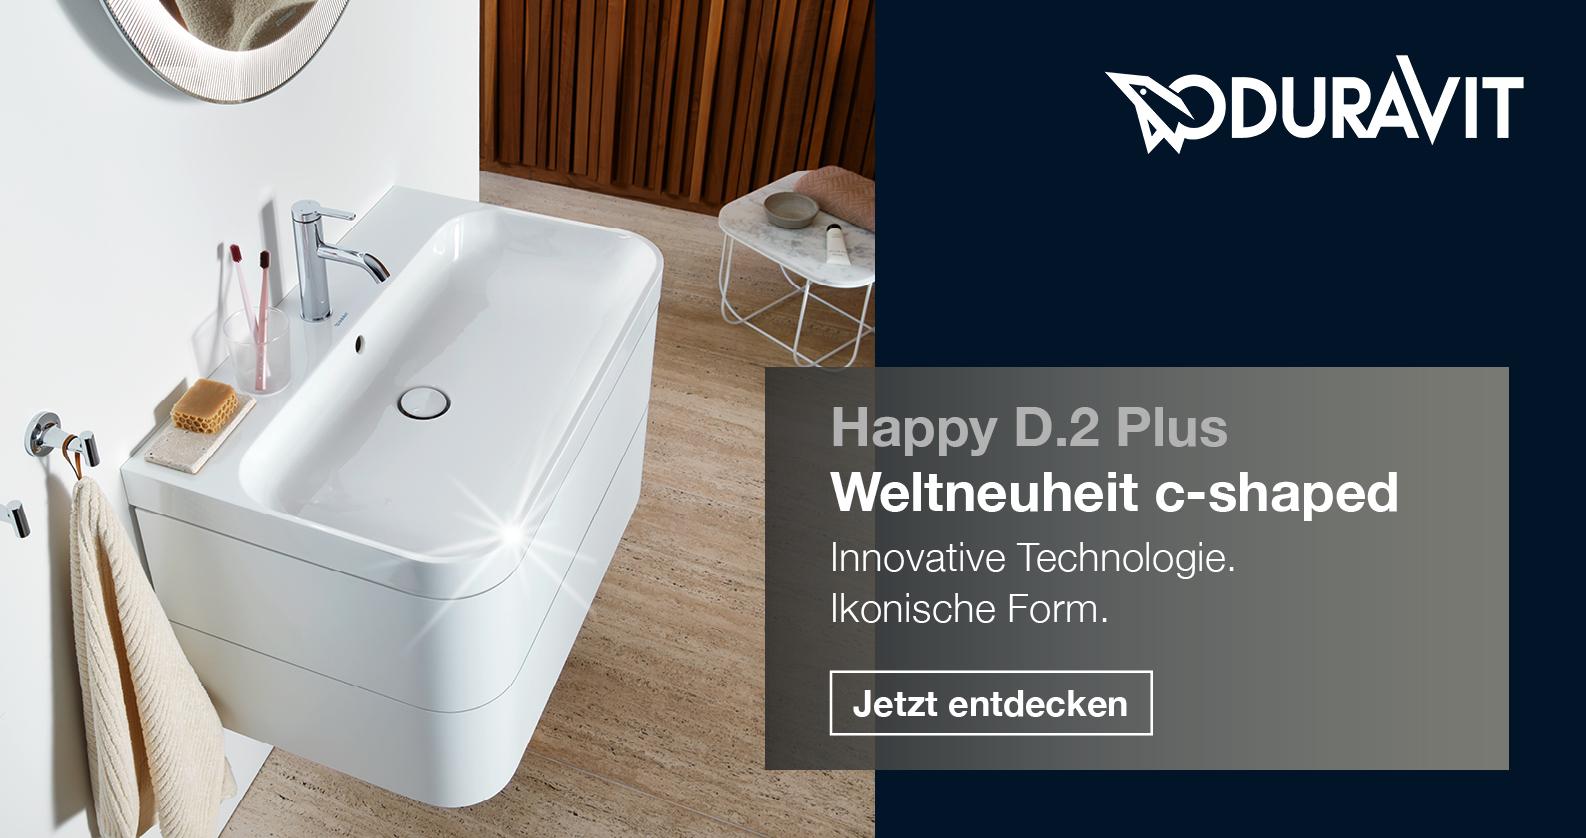 Duravit Happy D.2 Plus bei xTWOstore